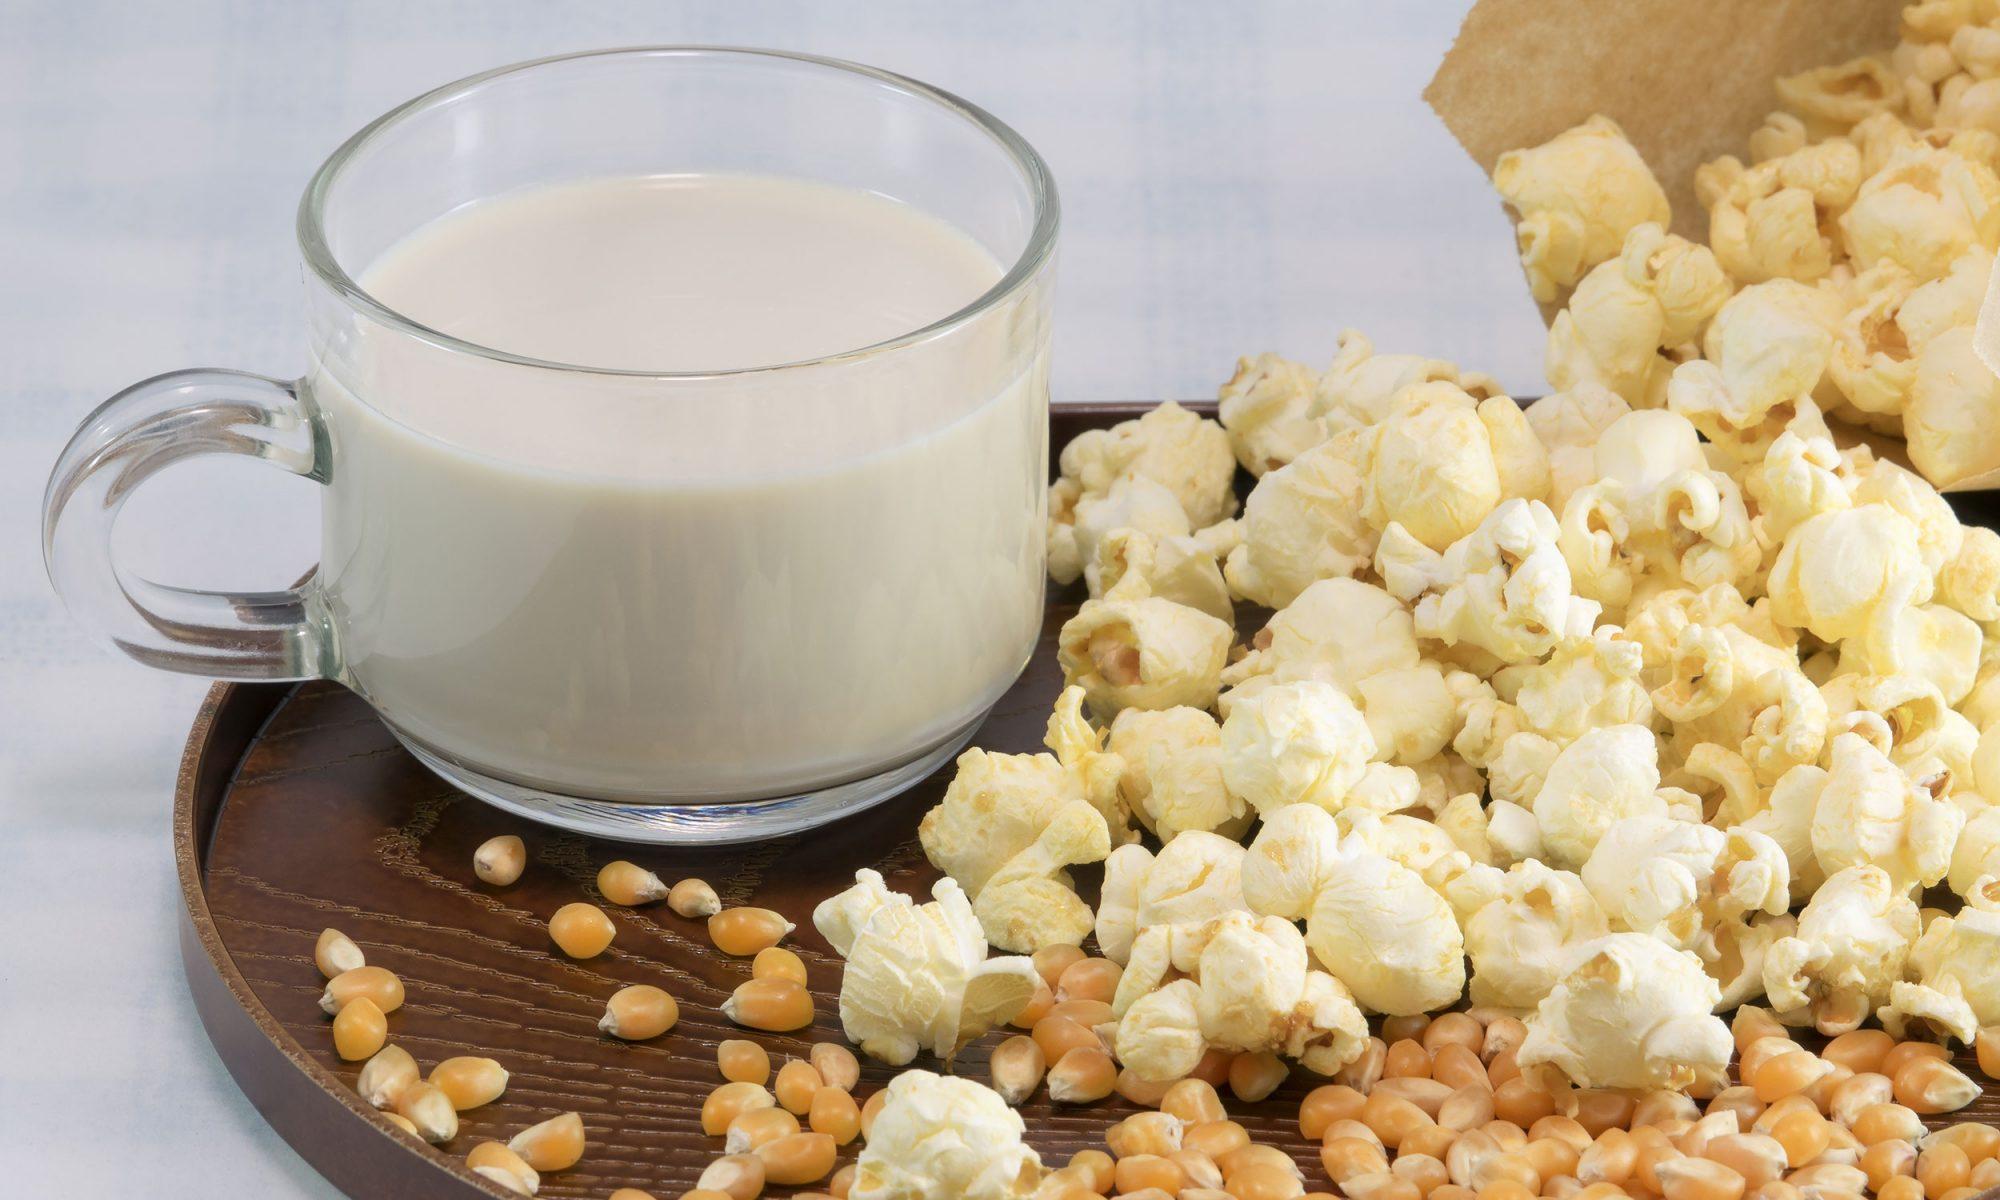 EC: Popcorn and Milk Is the OG Breakfast Cereal